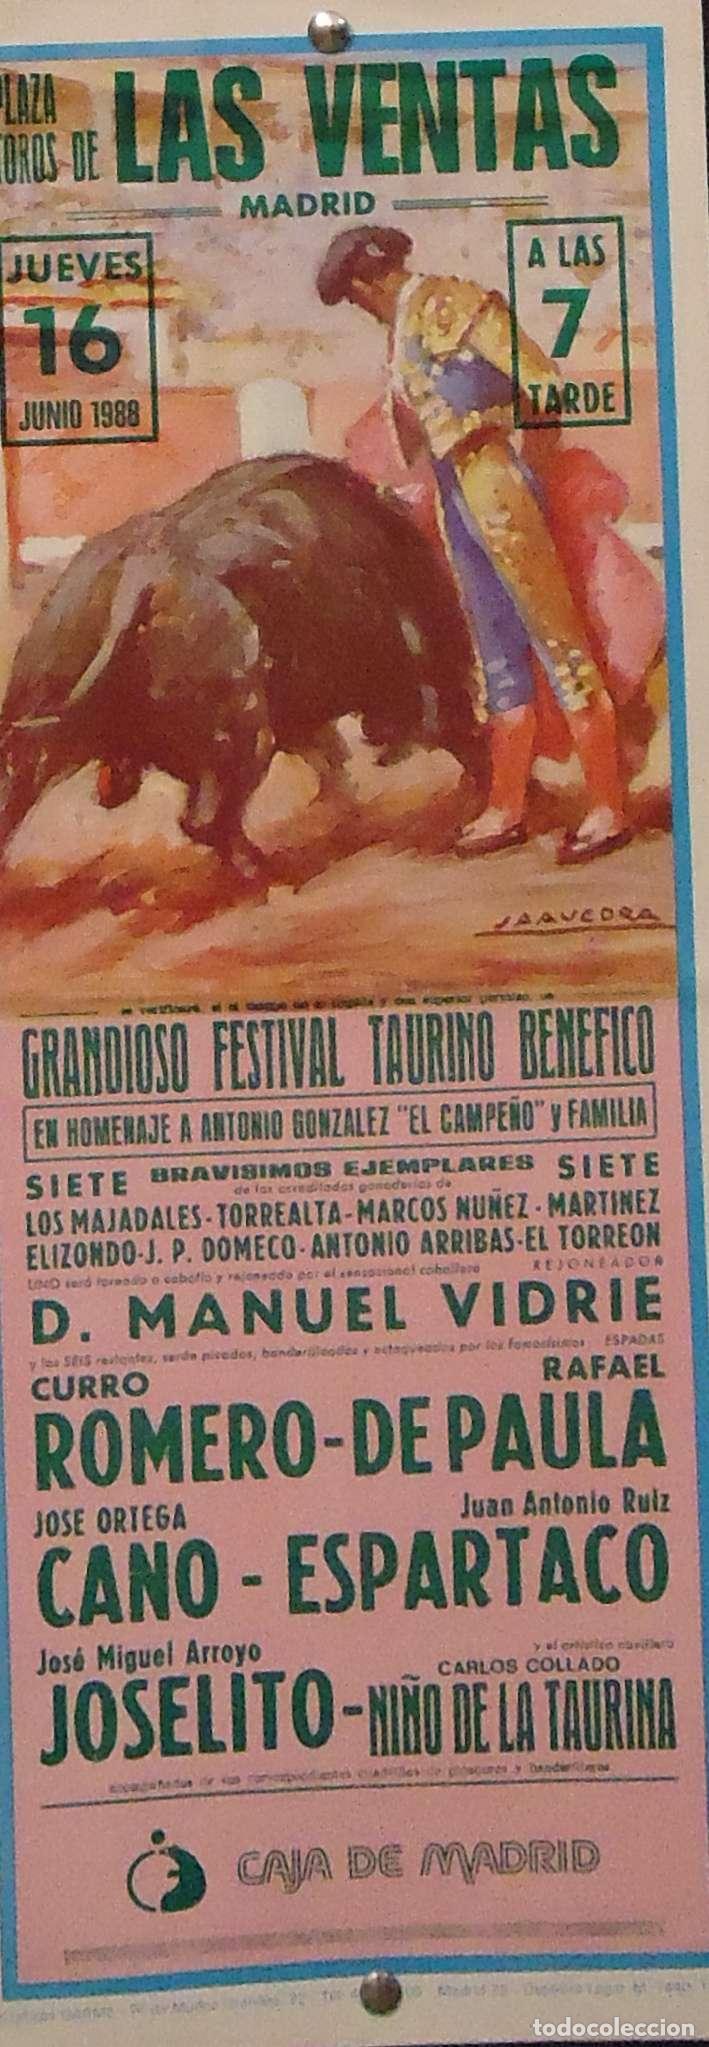 1988 CARTEL PLAZA TOROS DE MADRID 16 JUNIO 1988 MED 18X46 (Coleccionismo - Carteles Gran Formato - Carteles Toros)